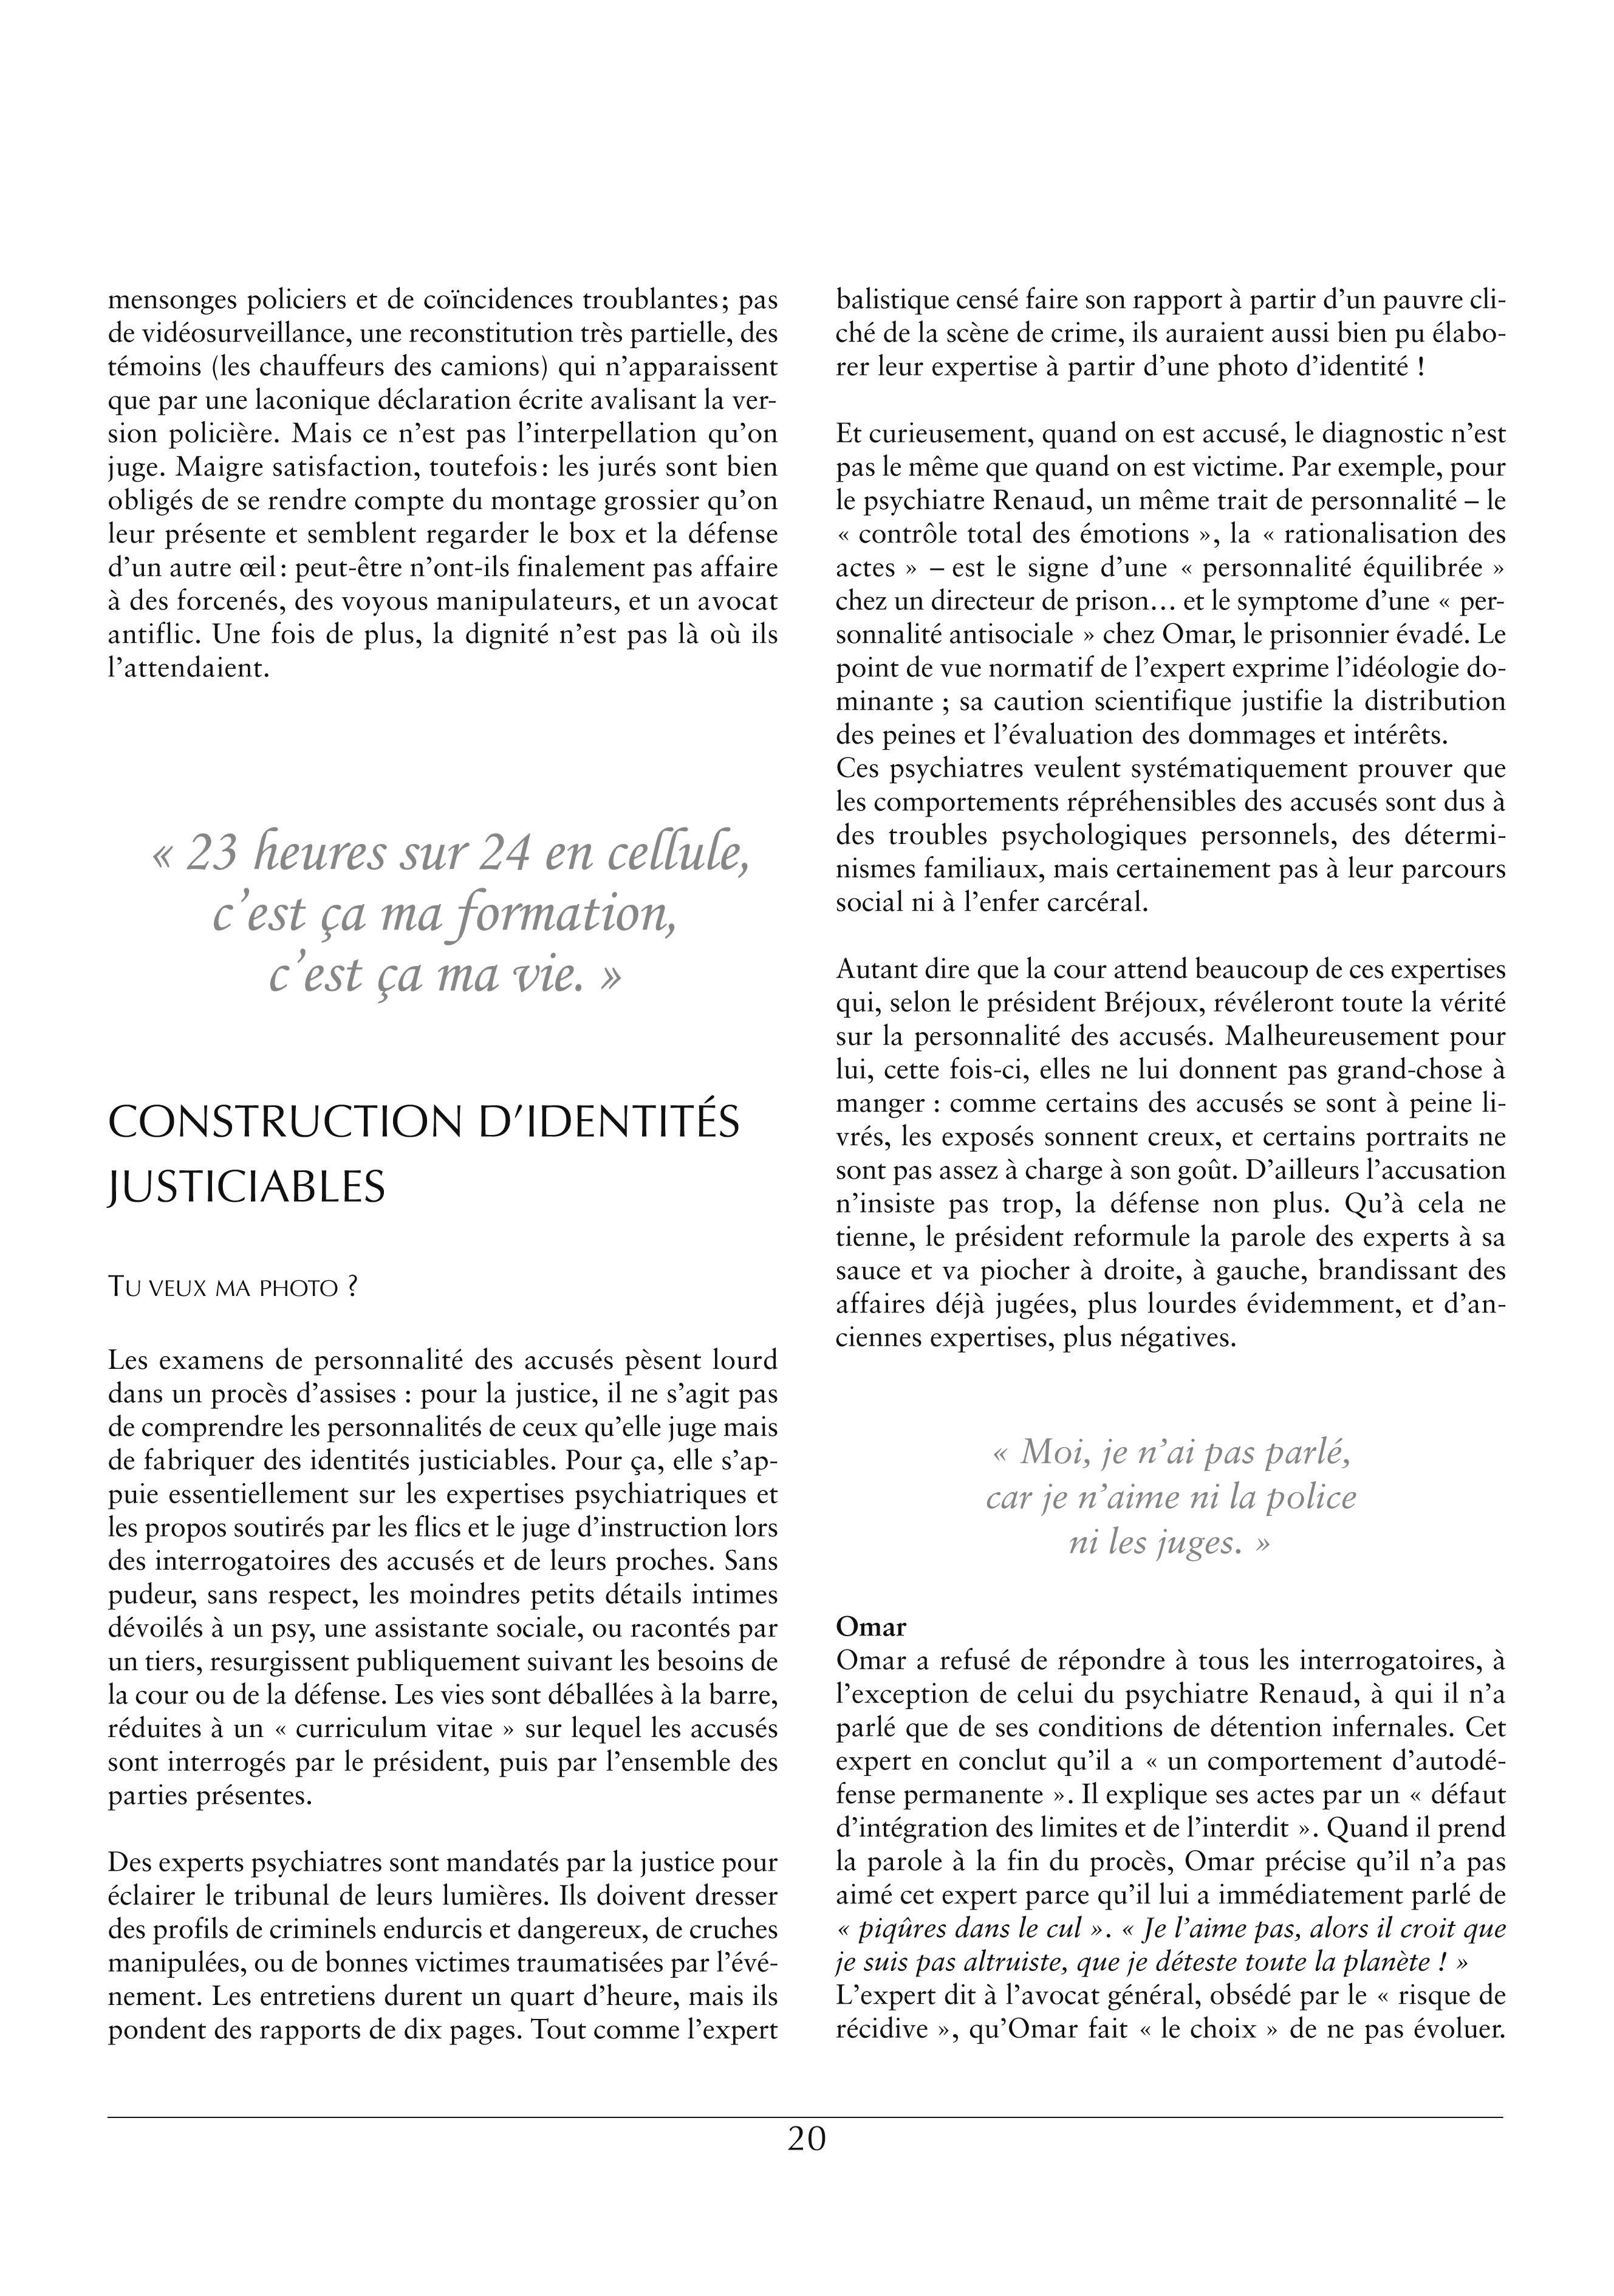 lenvolee_35 1_Page_20